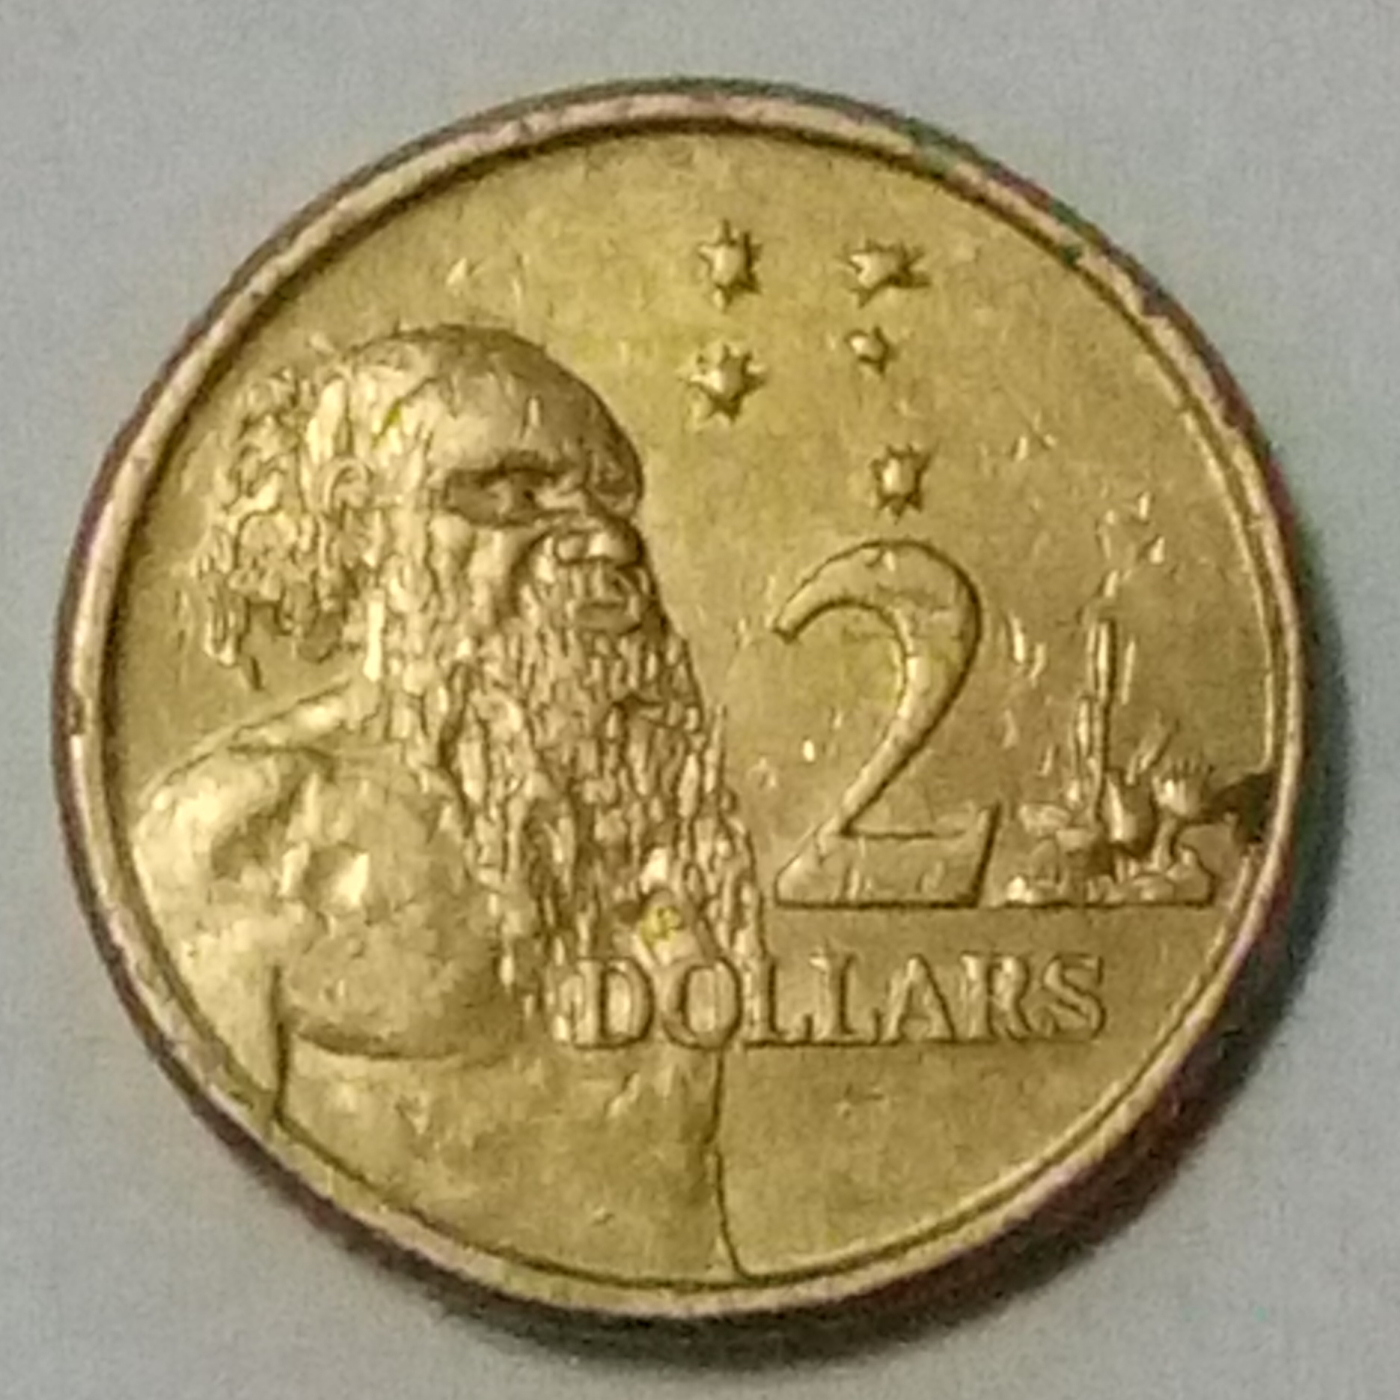 2 Dollars 2005